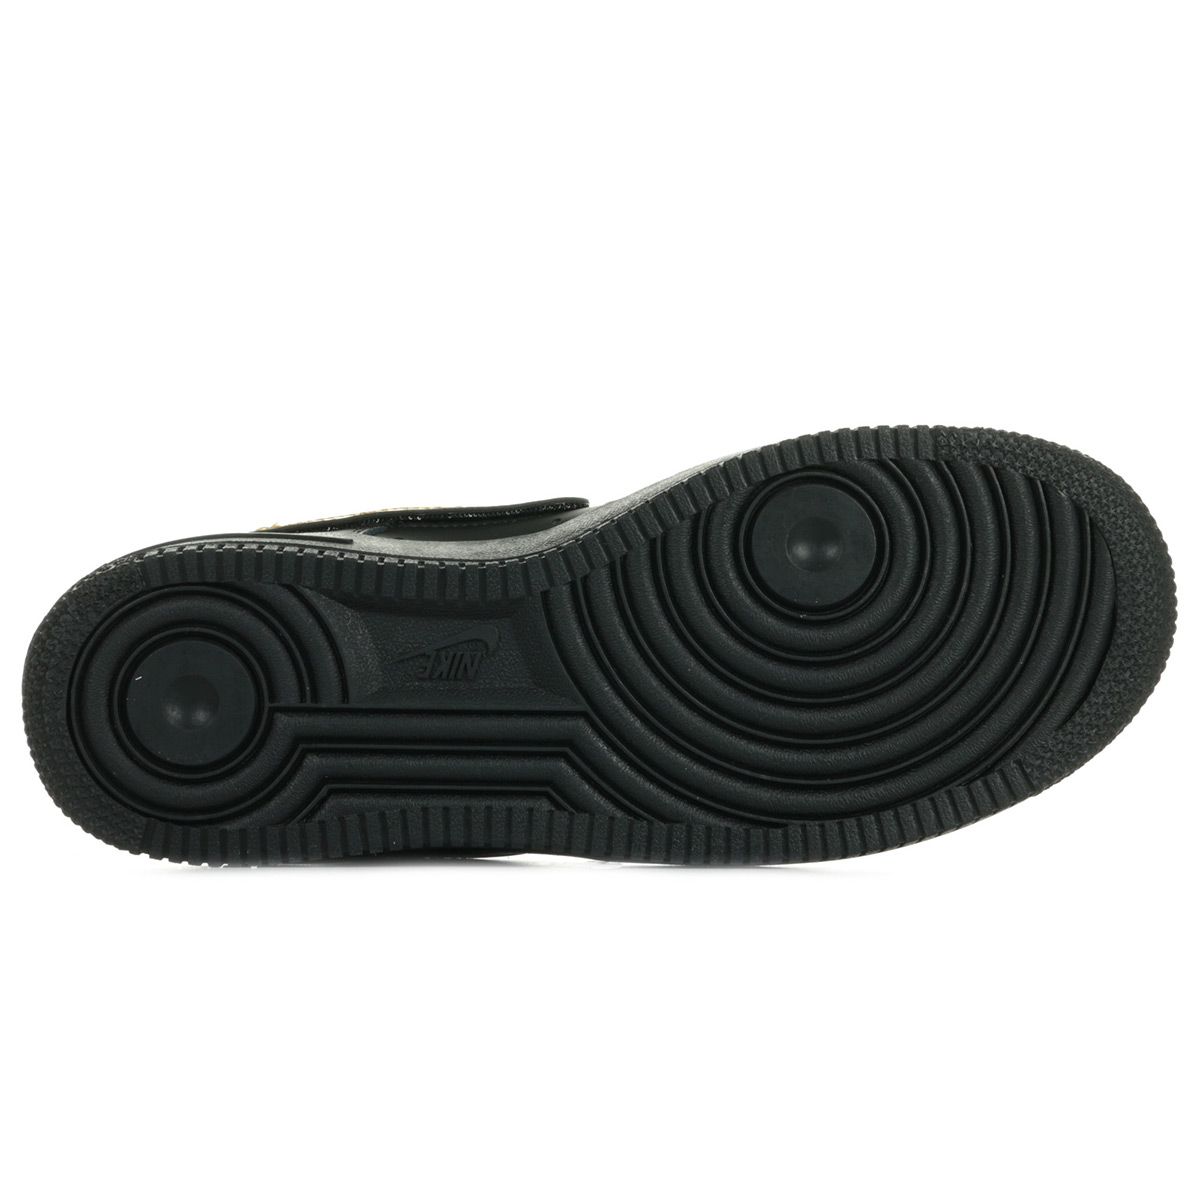 Nike Air Force 1 LV8 3 AR7446001, Baskets mode